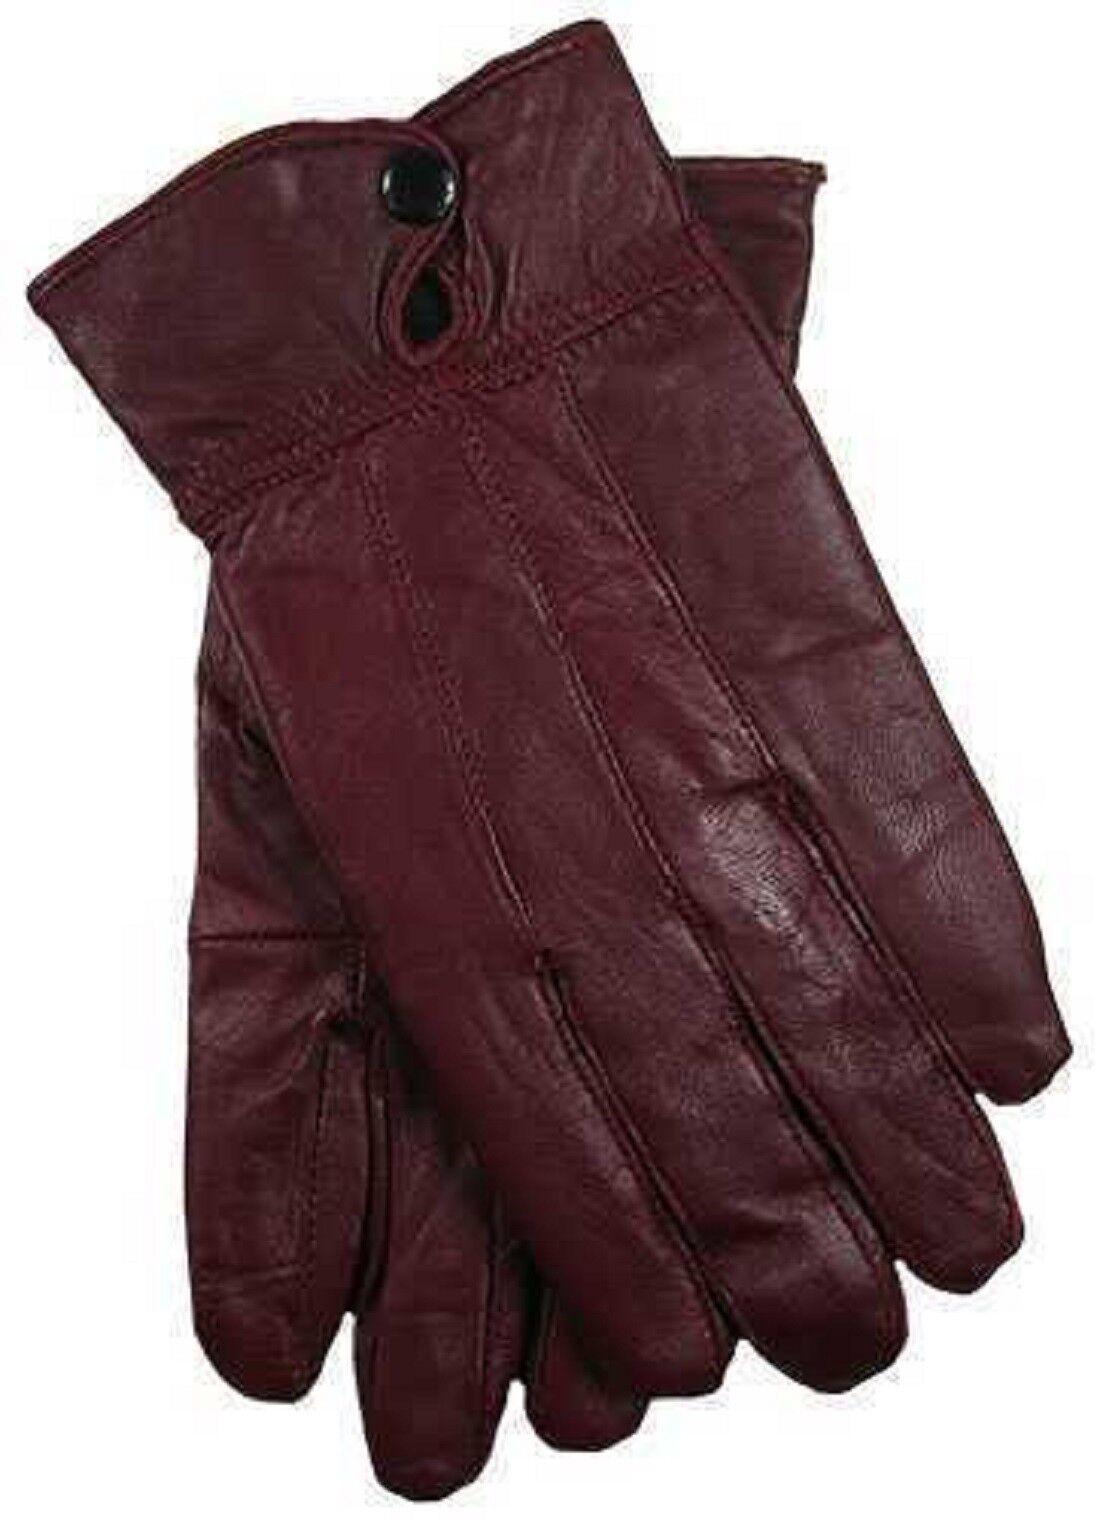 Ladies 100% Genuine Sheepskin Leather Lined Gloves Driving Dress Winter Warm